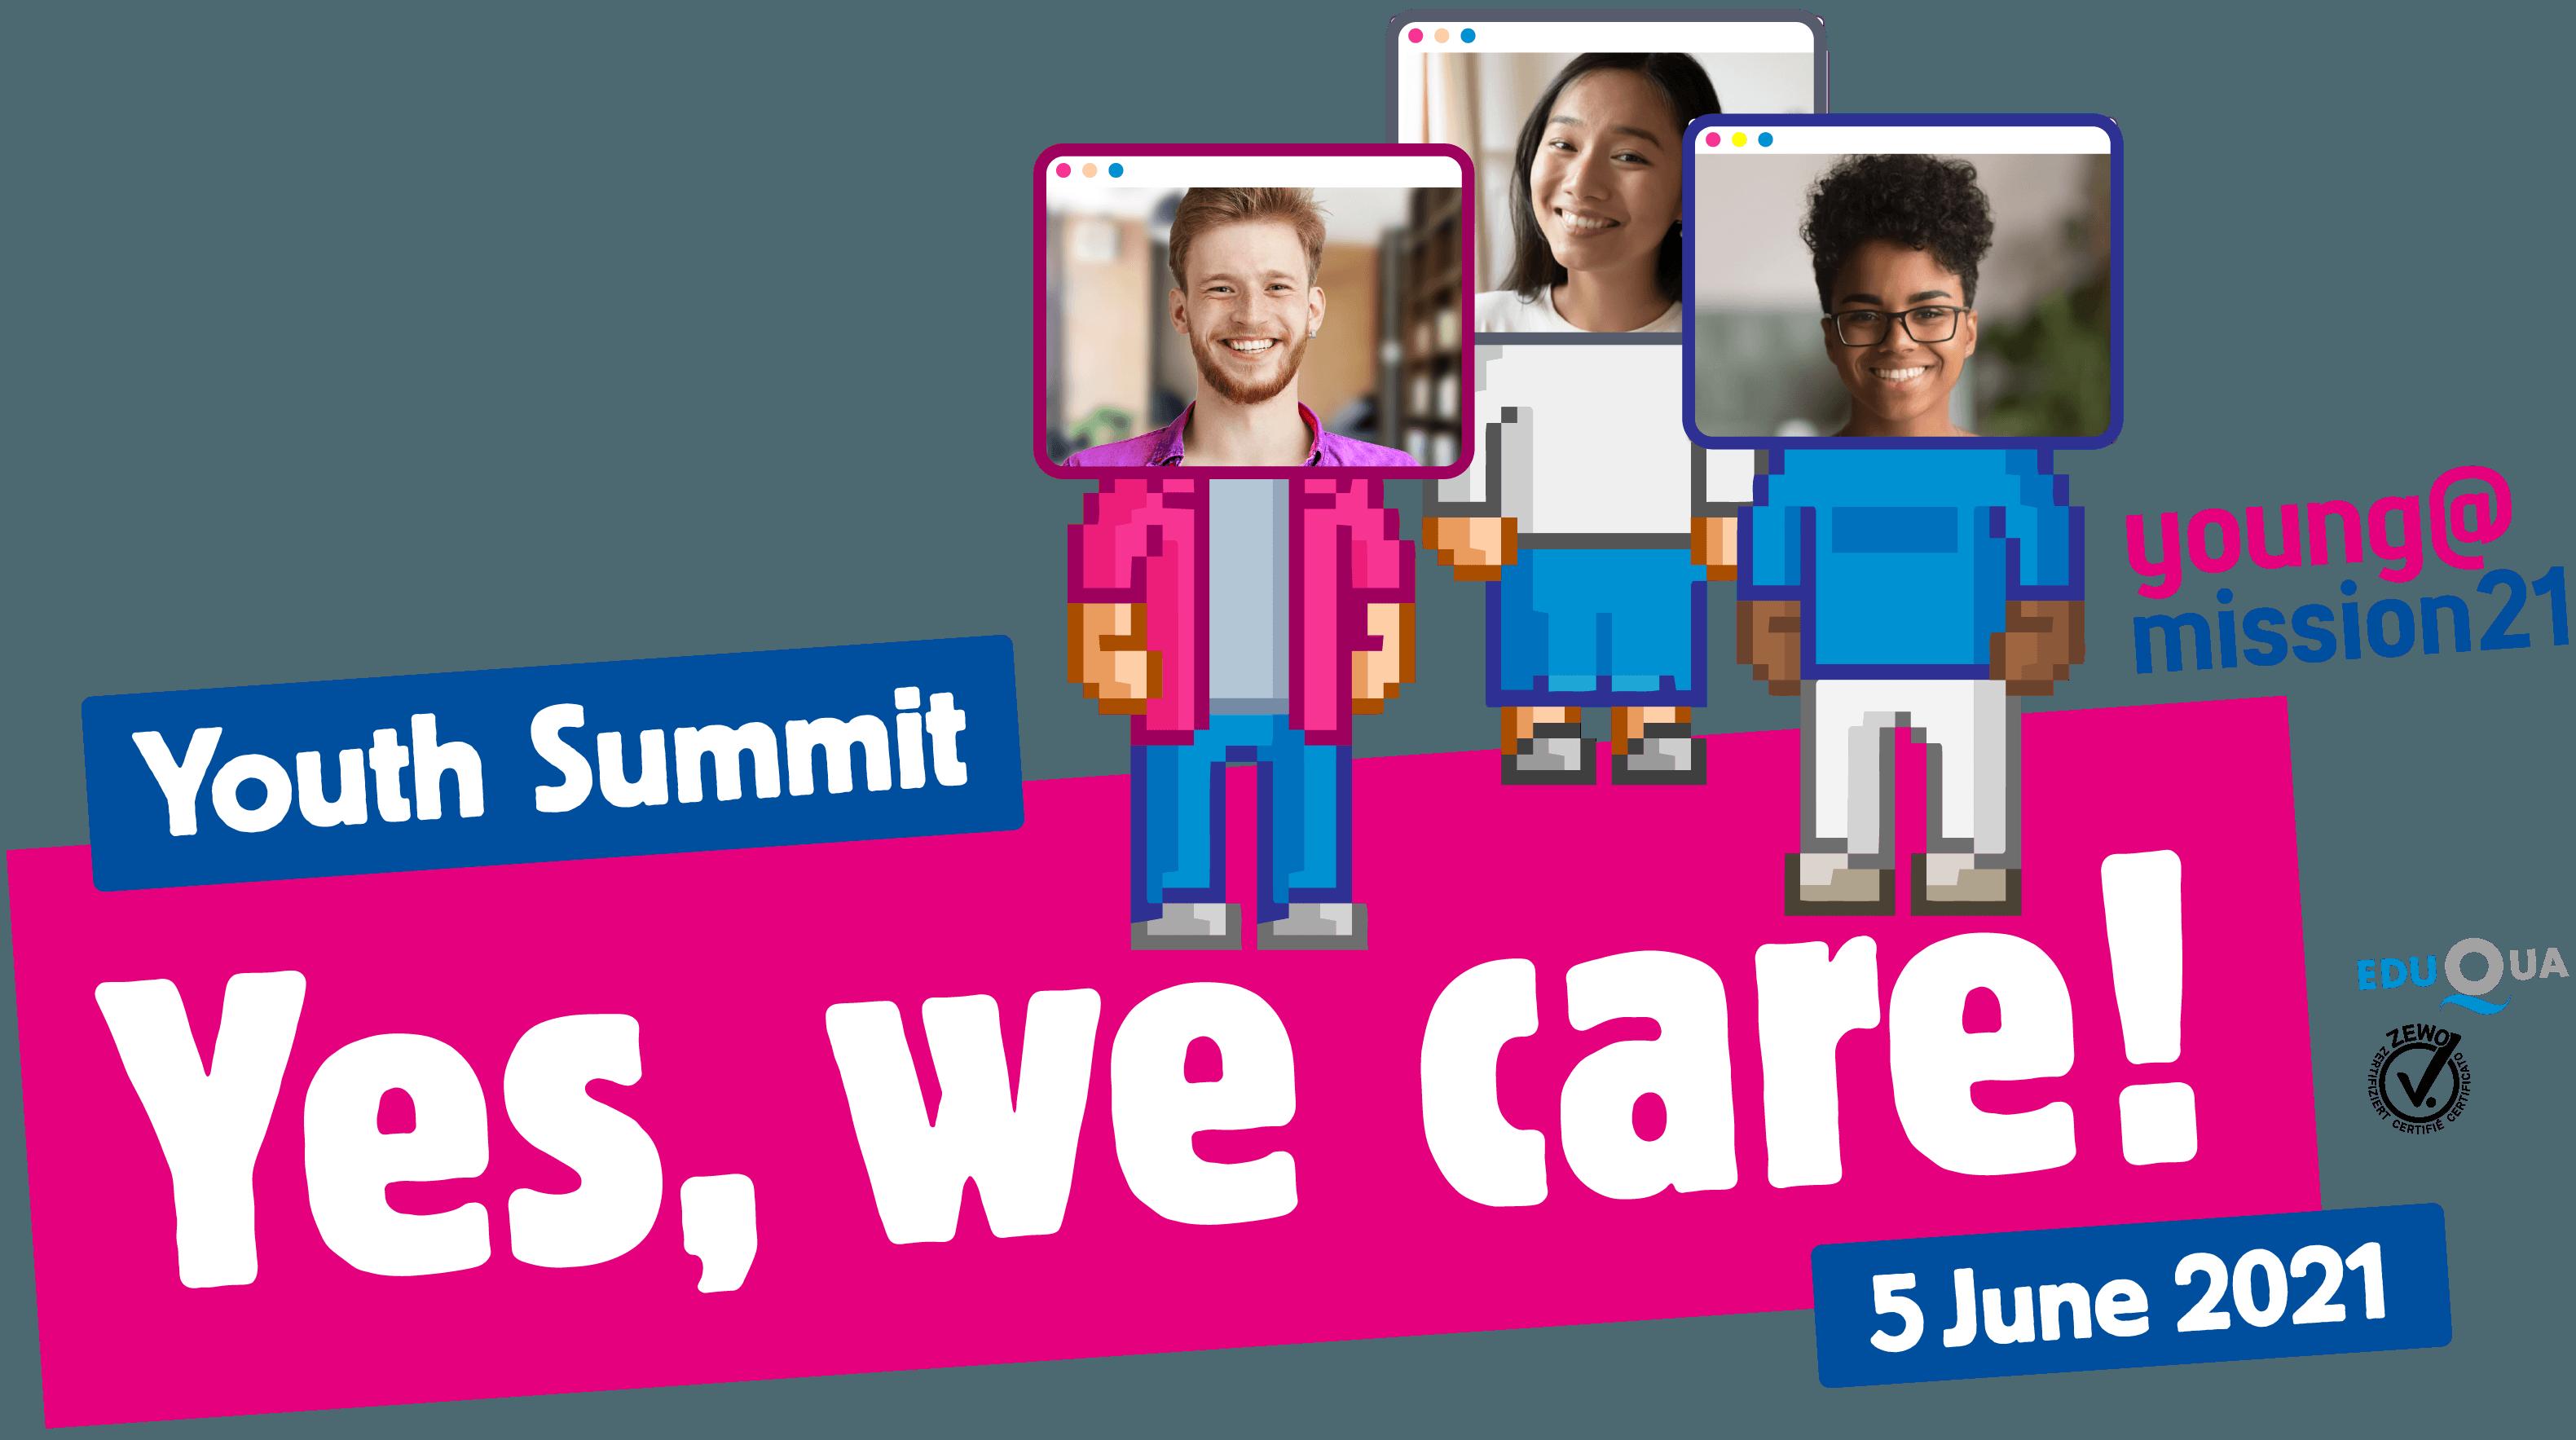 Youth Summit 2021